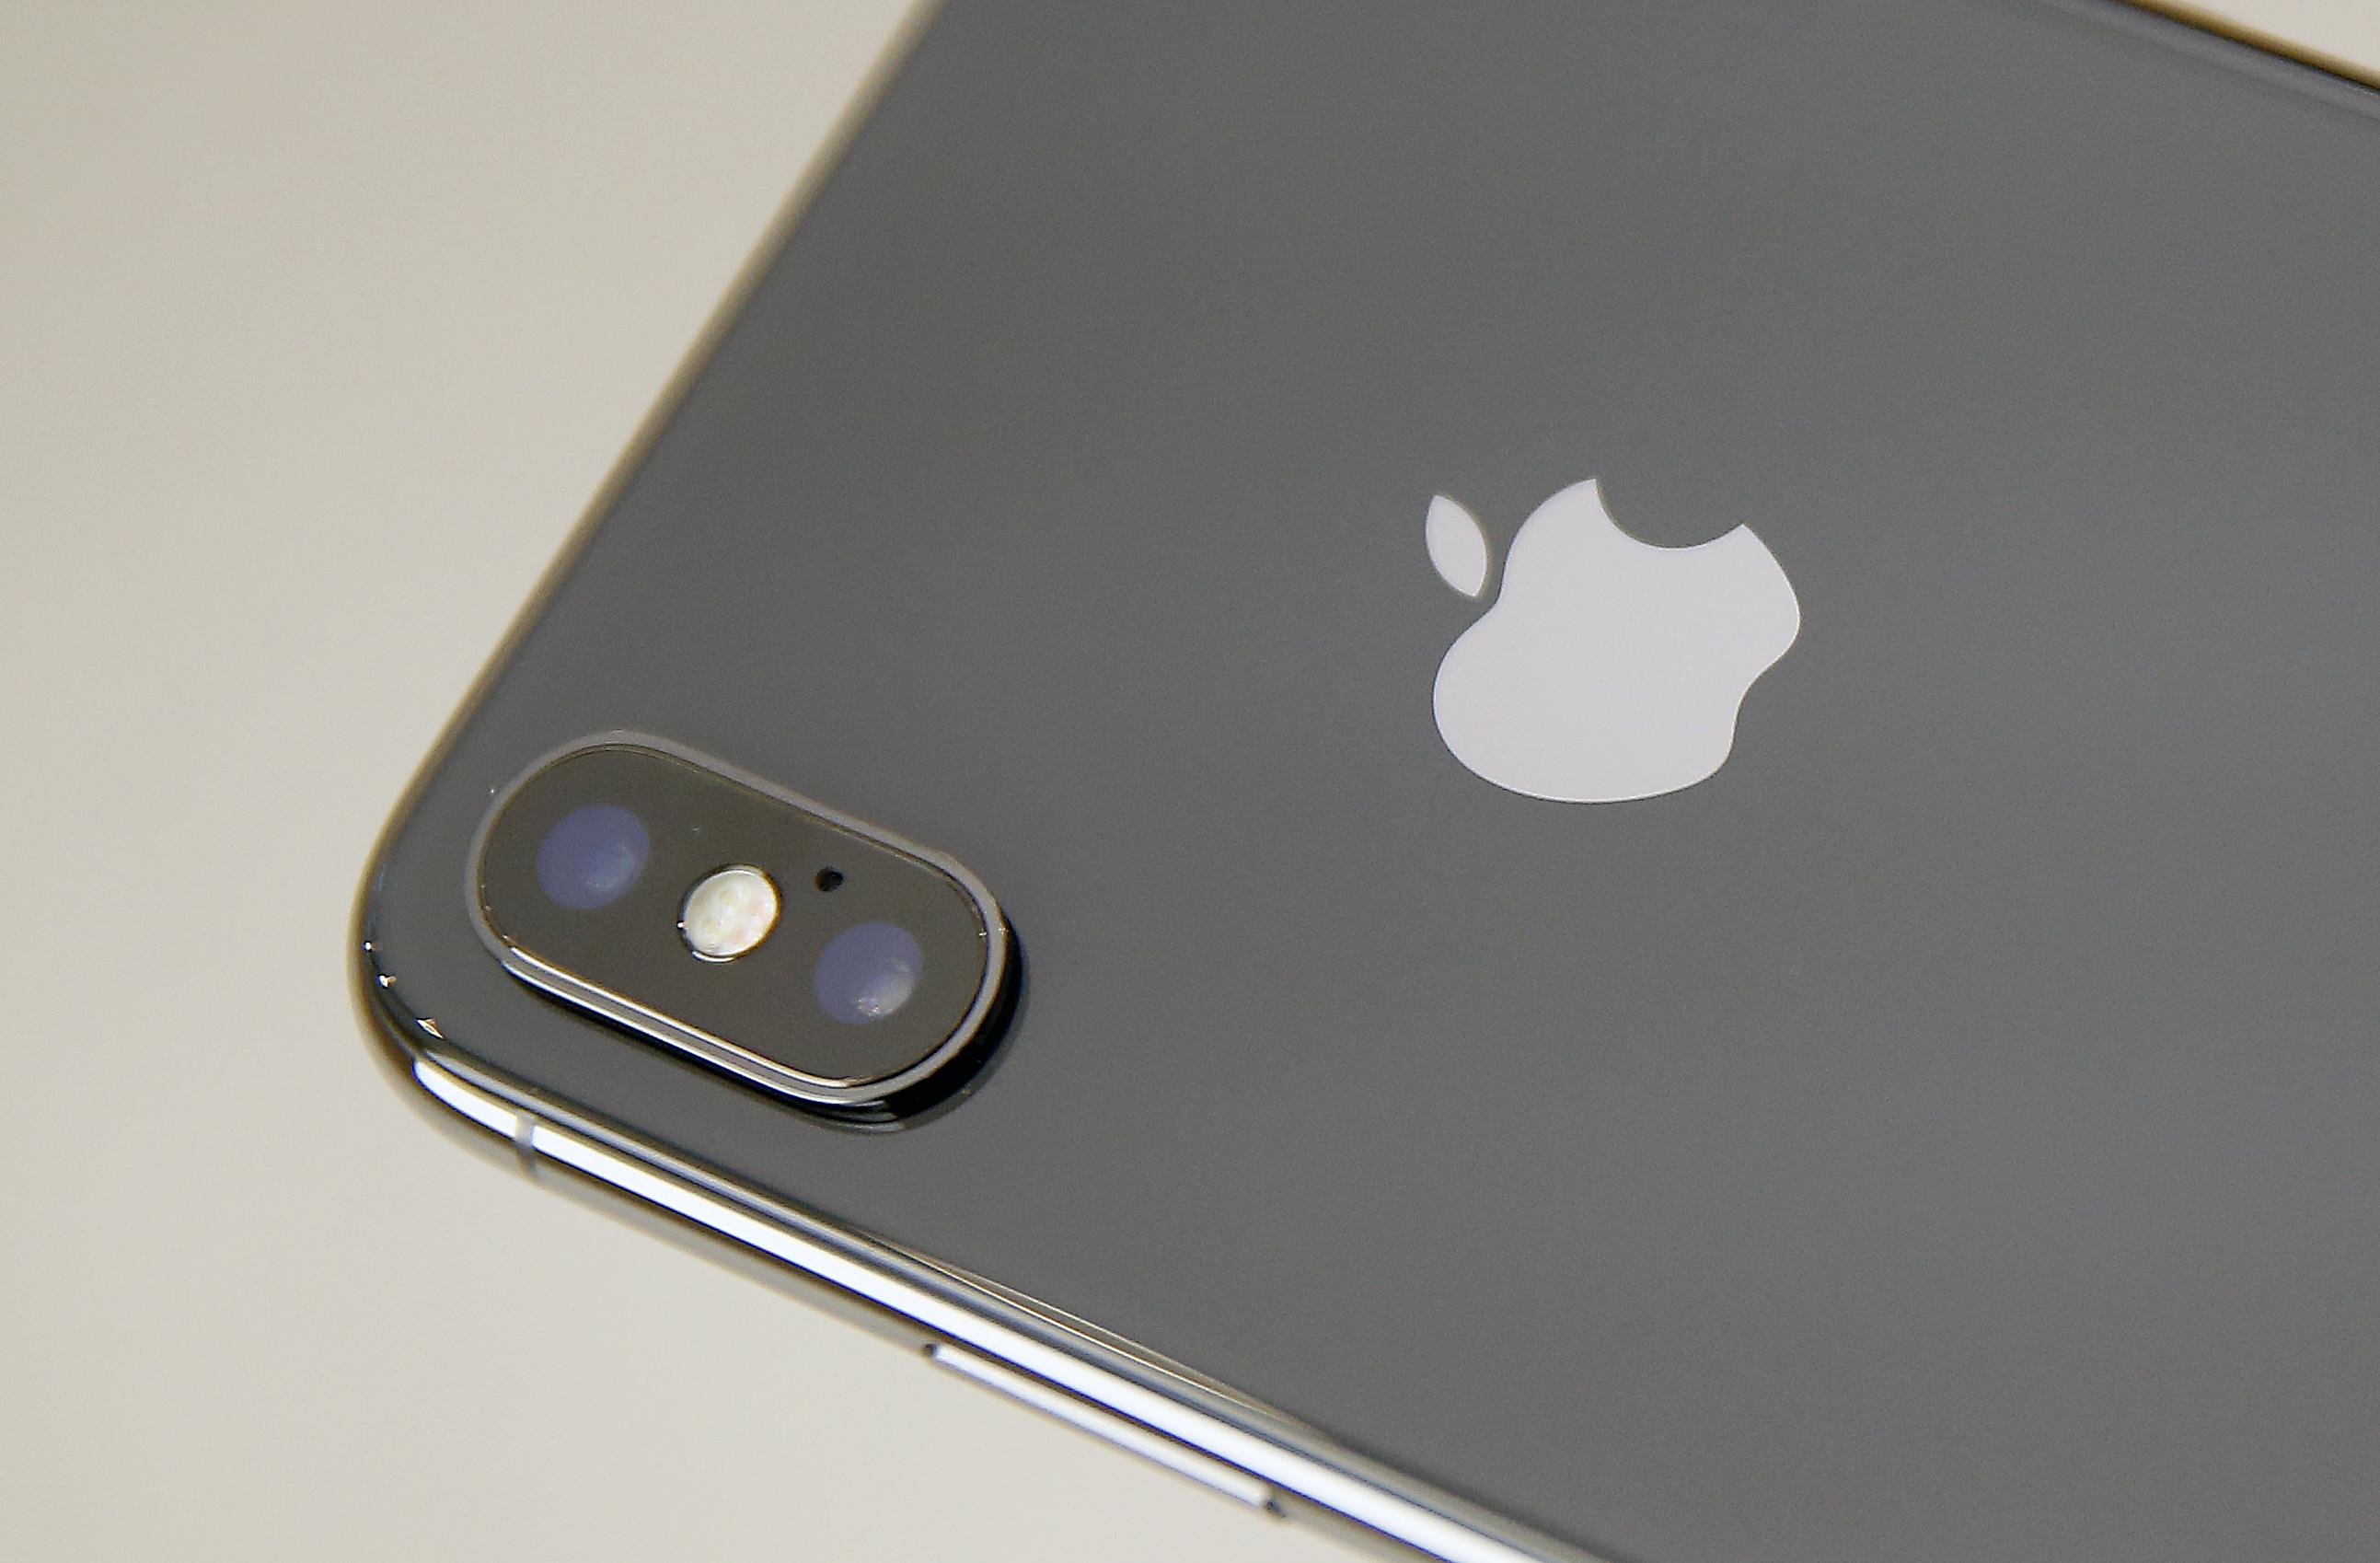 Launch Of Iphone X At Apple Store Saint Germain In Paris